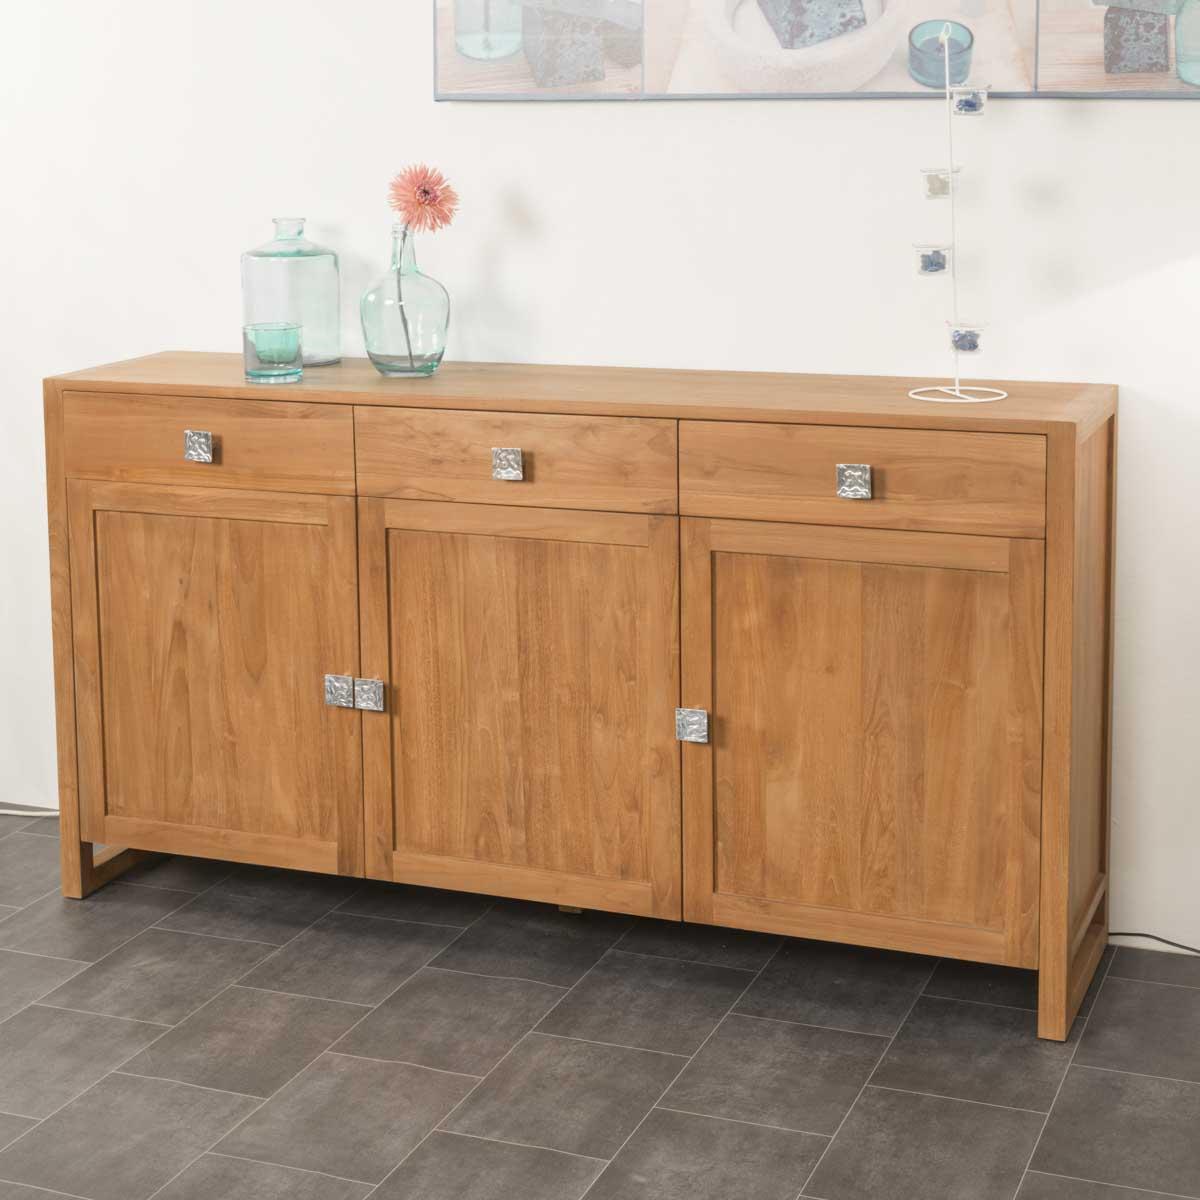 buffet de salon en bois de teck massif thea rectangle naturel l 170 cm. Black Bedroom Furniture Sets. Home Design Ideas